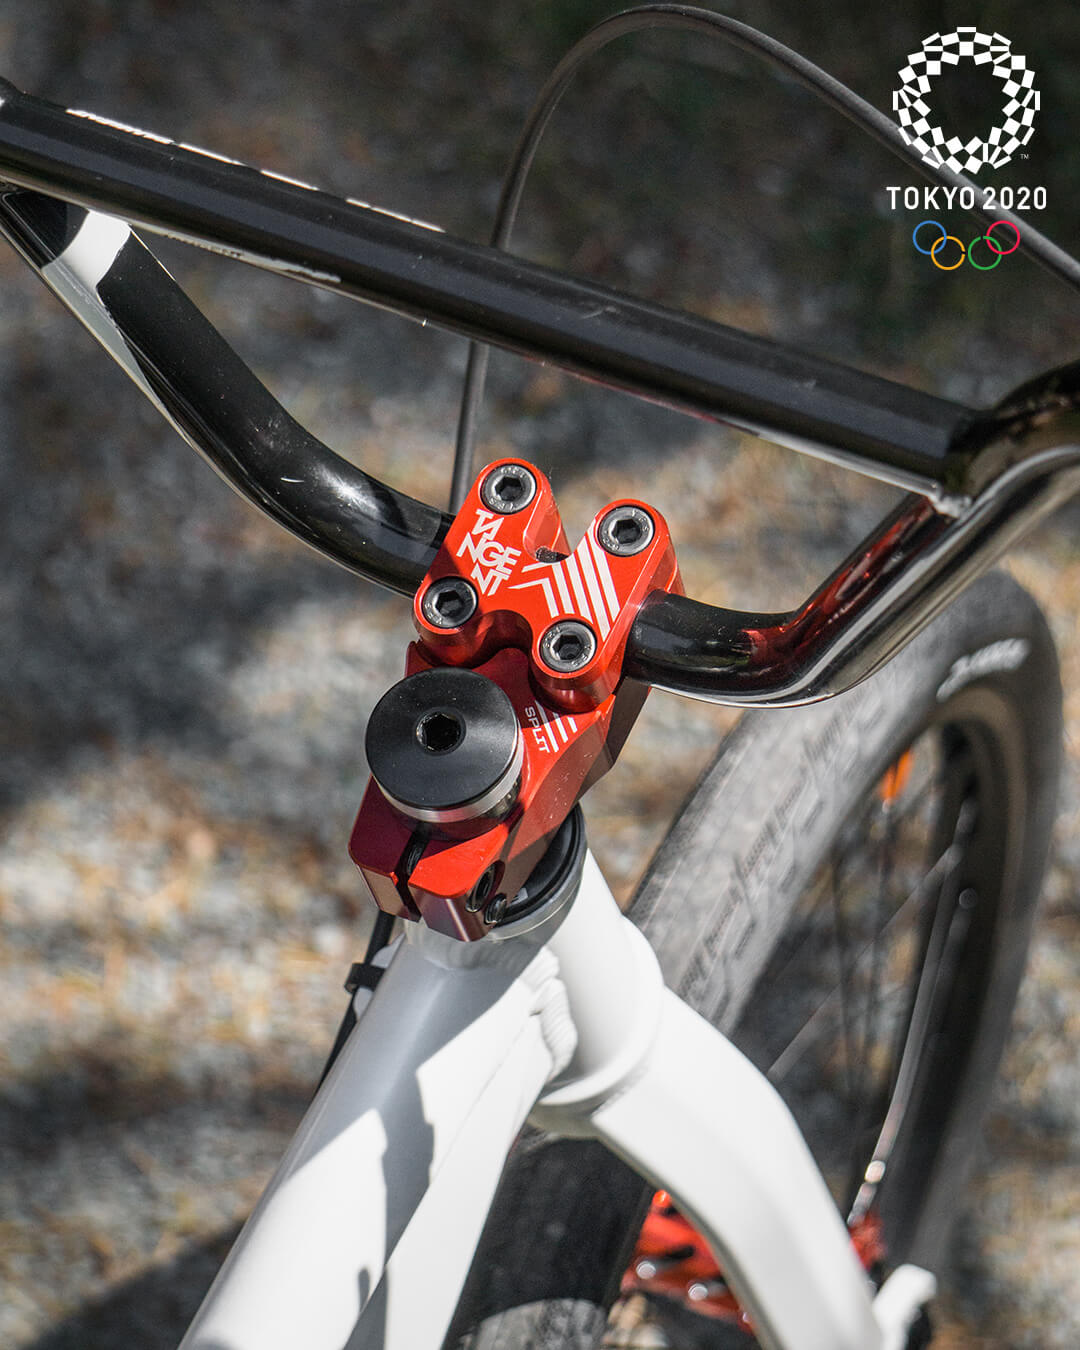 Drew Mechielsen Tokyo Olympic Bike Check 6 - Niels Bensink